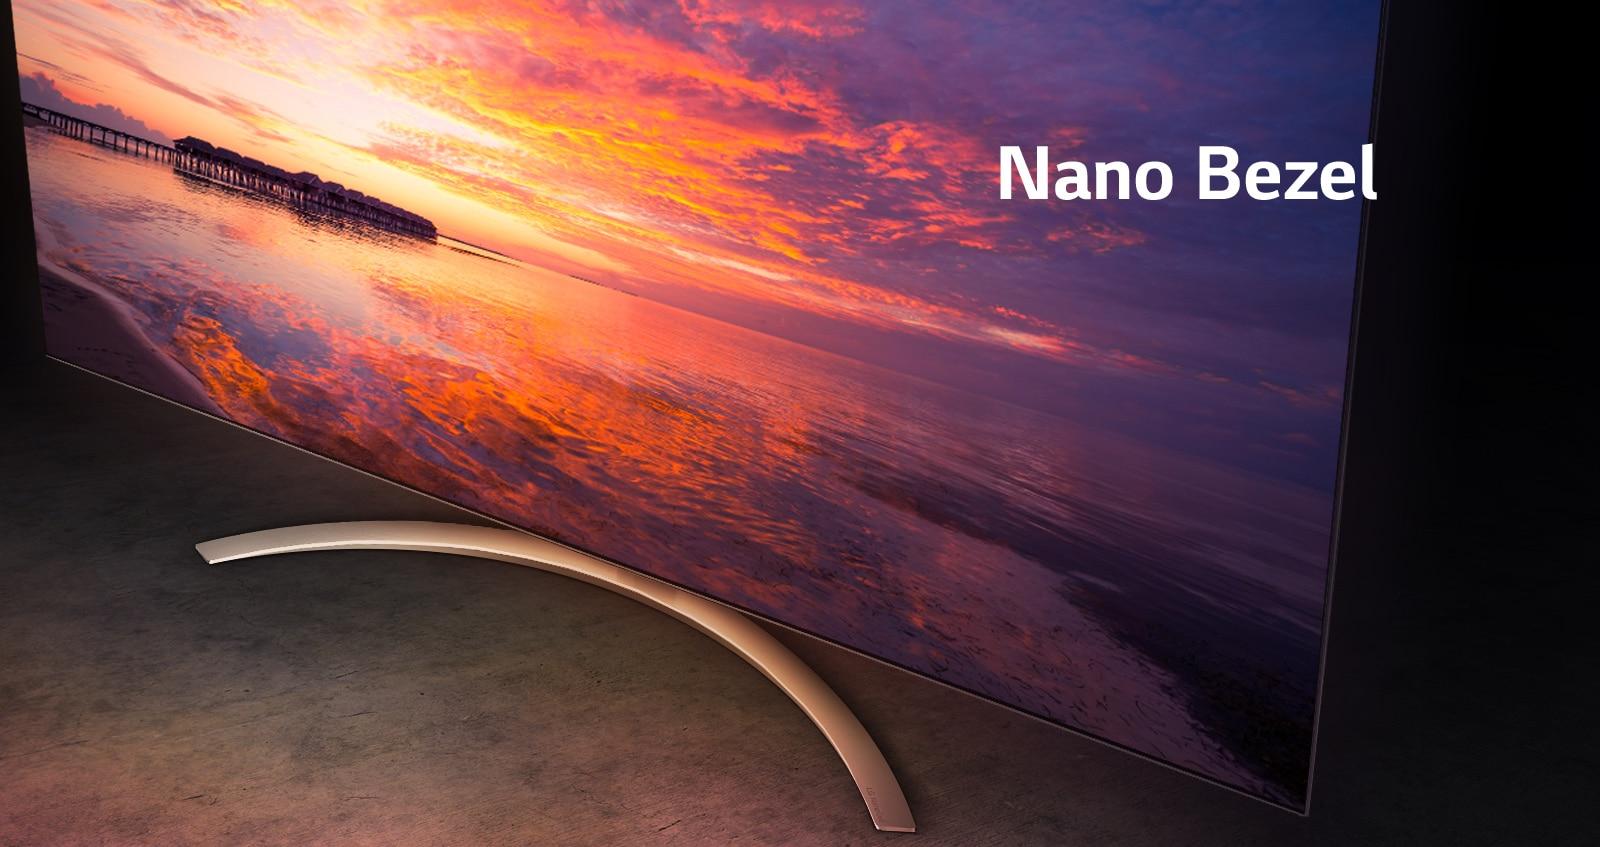 TV-NanoCell-SM86-11-Nano-Bezel-Desktop3